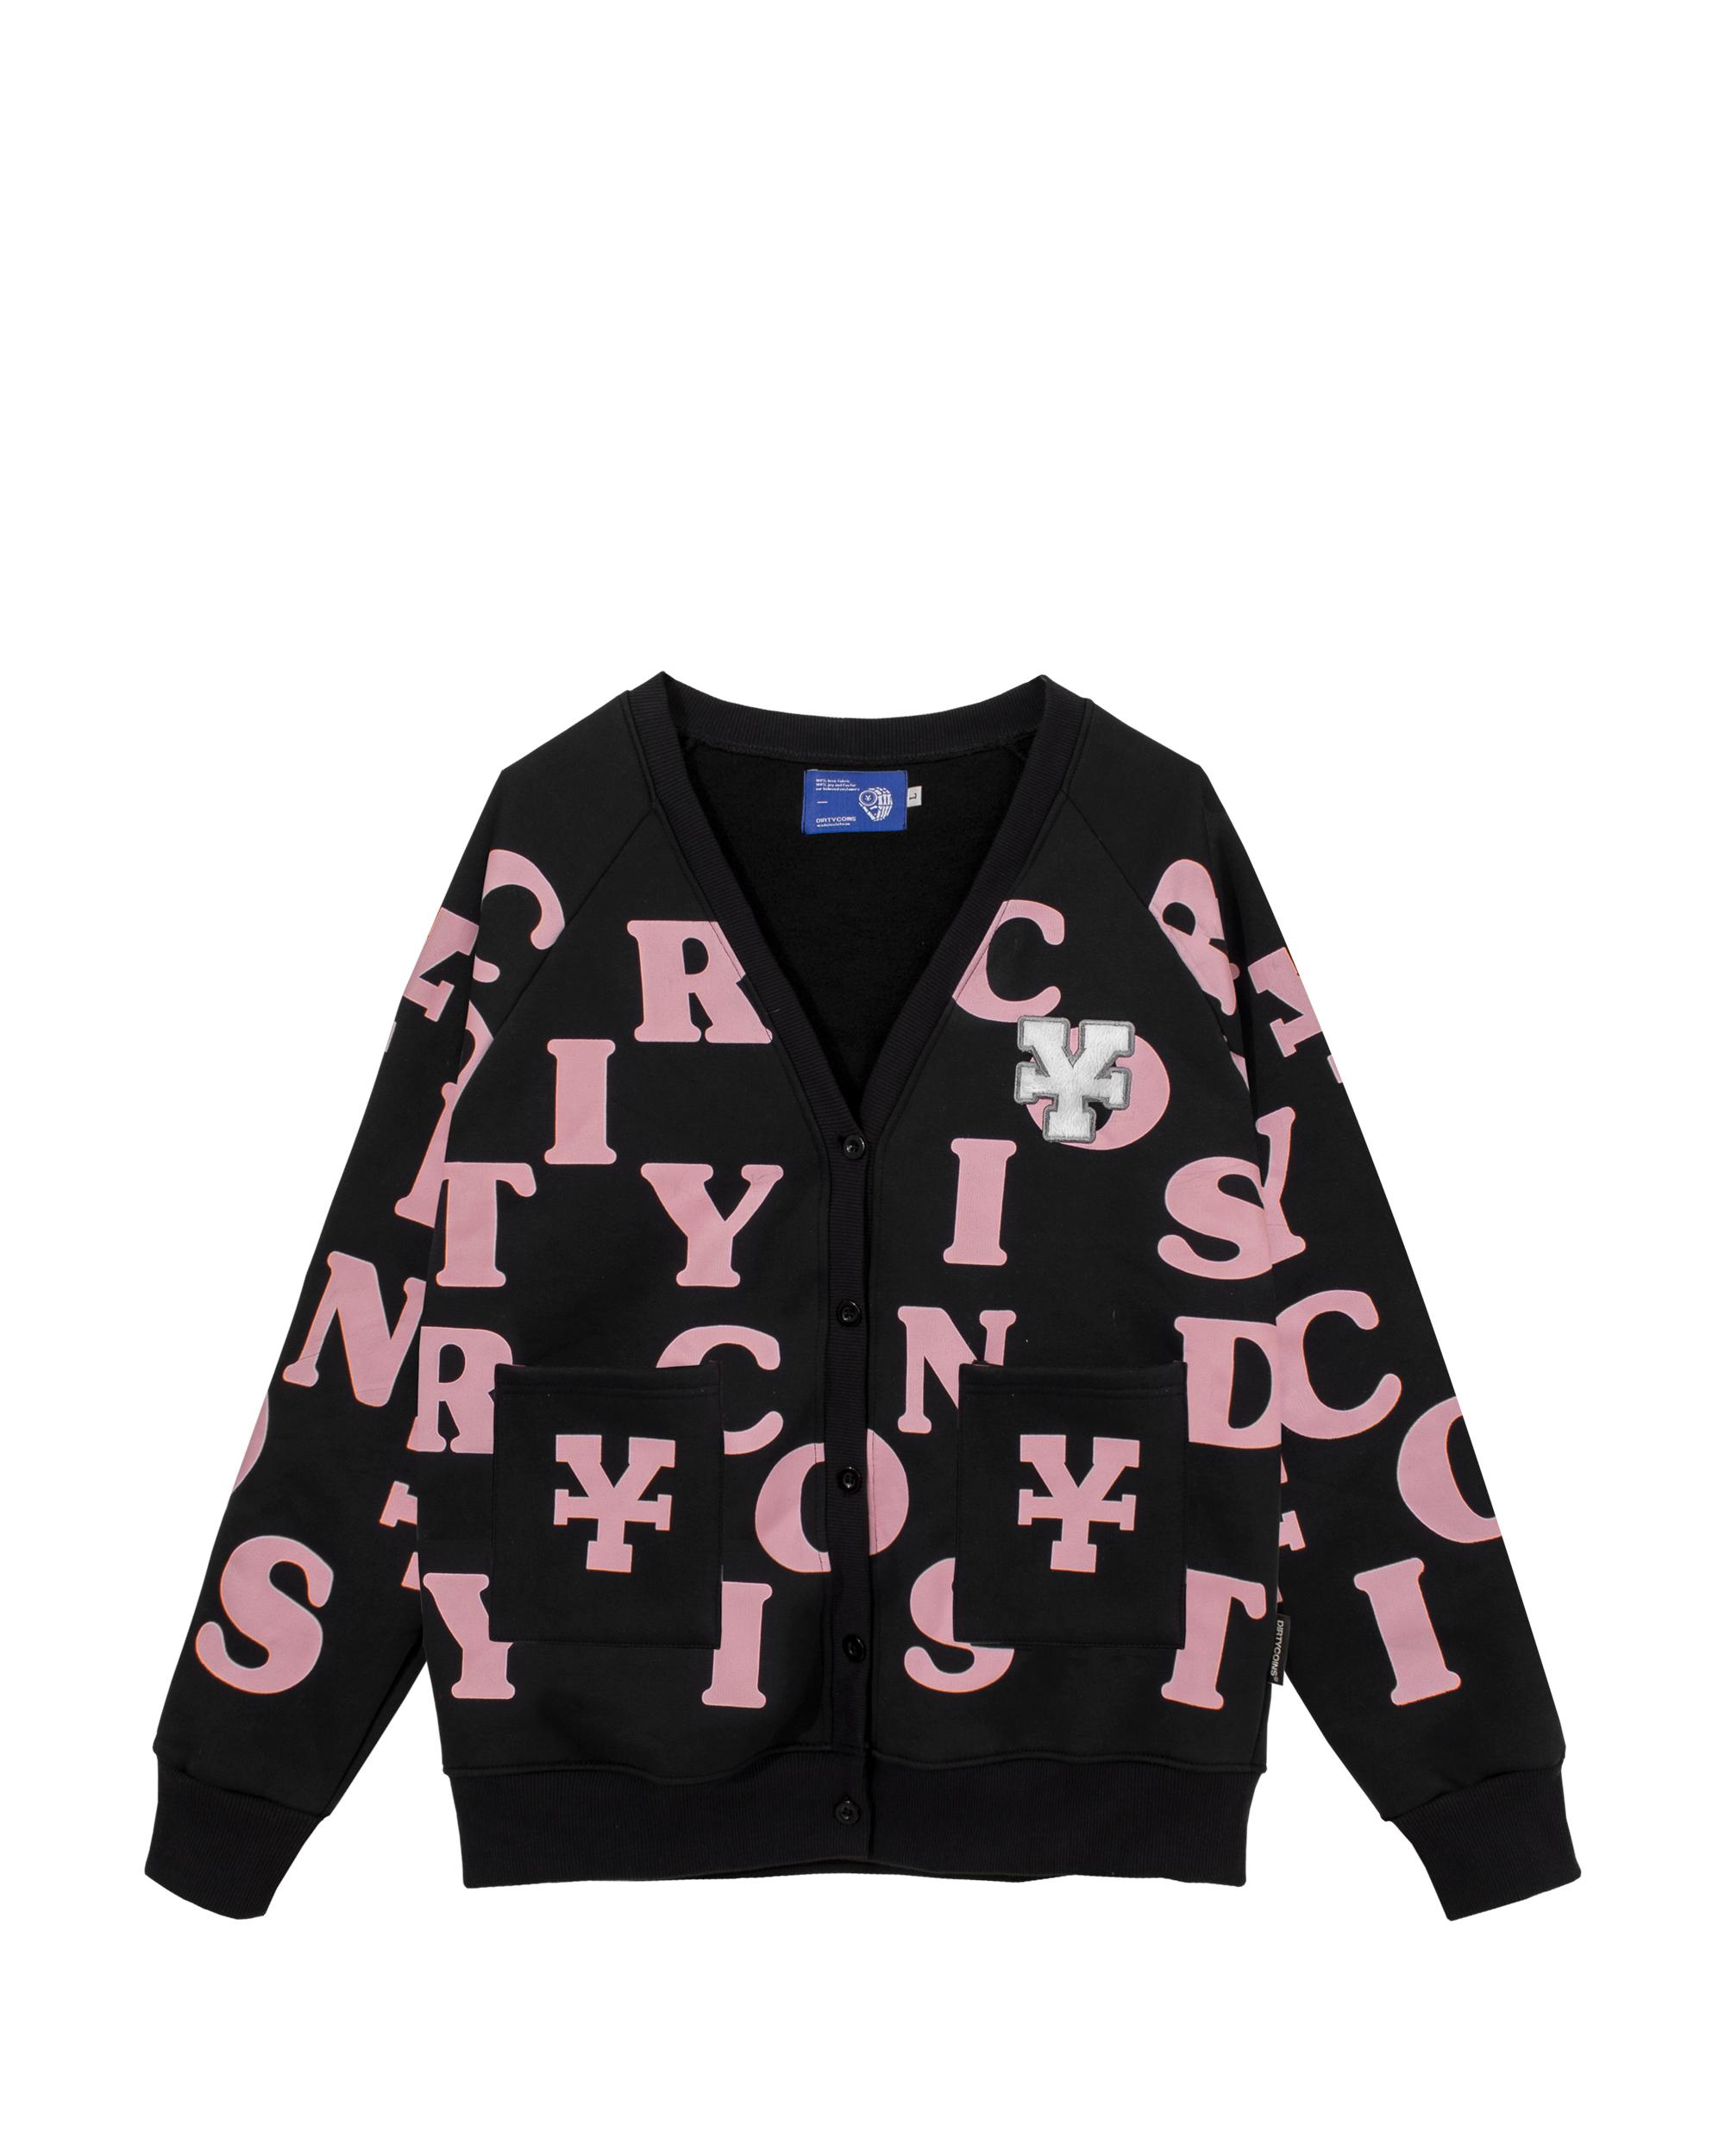 DirtyCoins Print Cardigan - Black/Pink